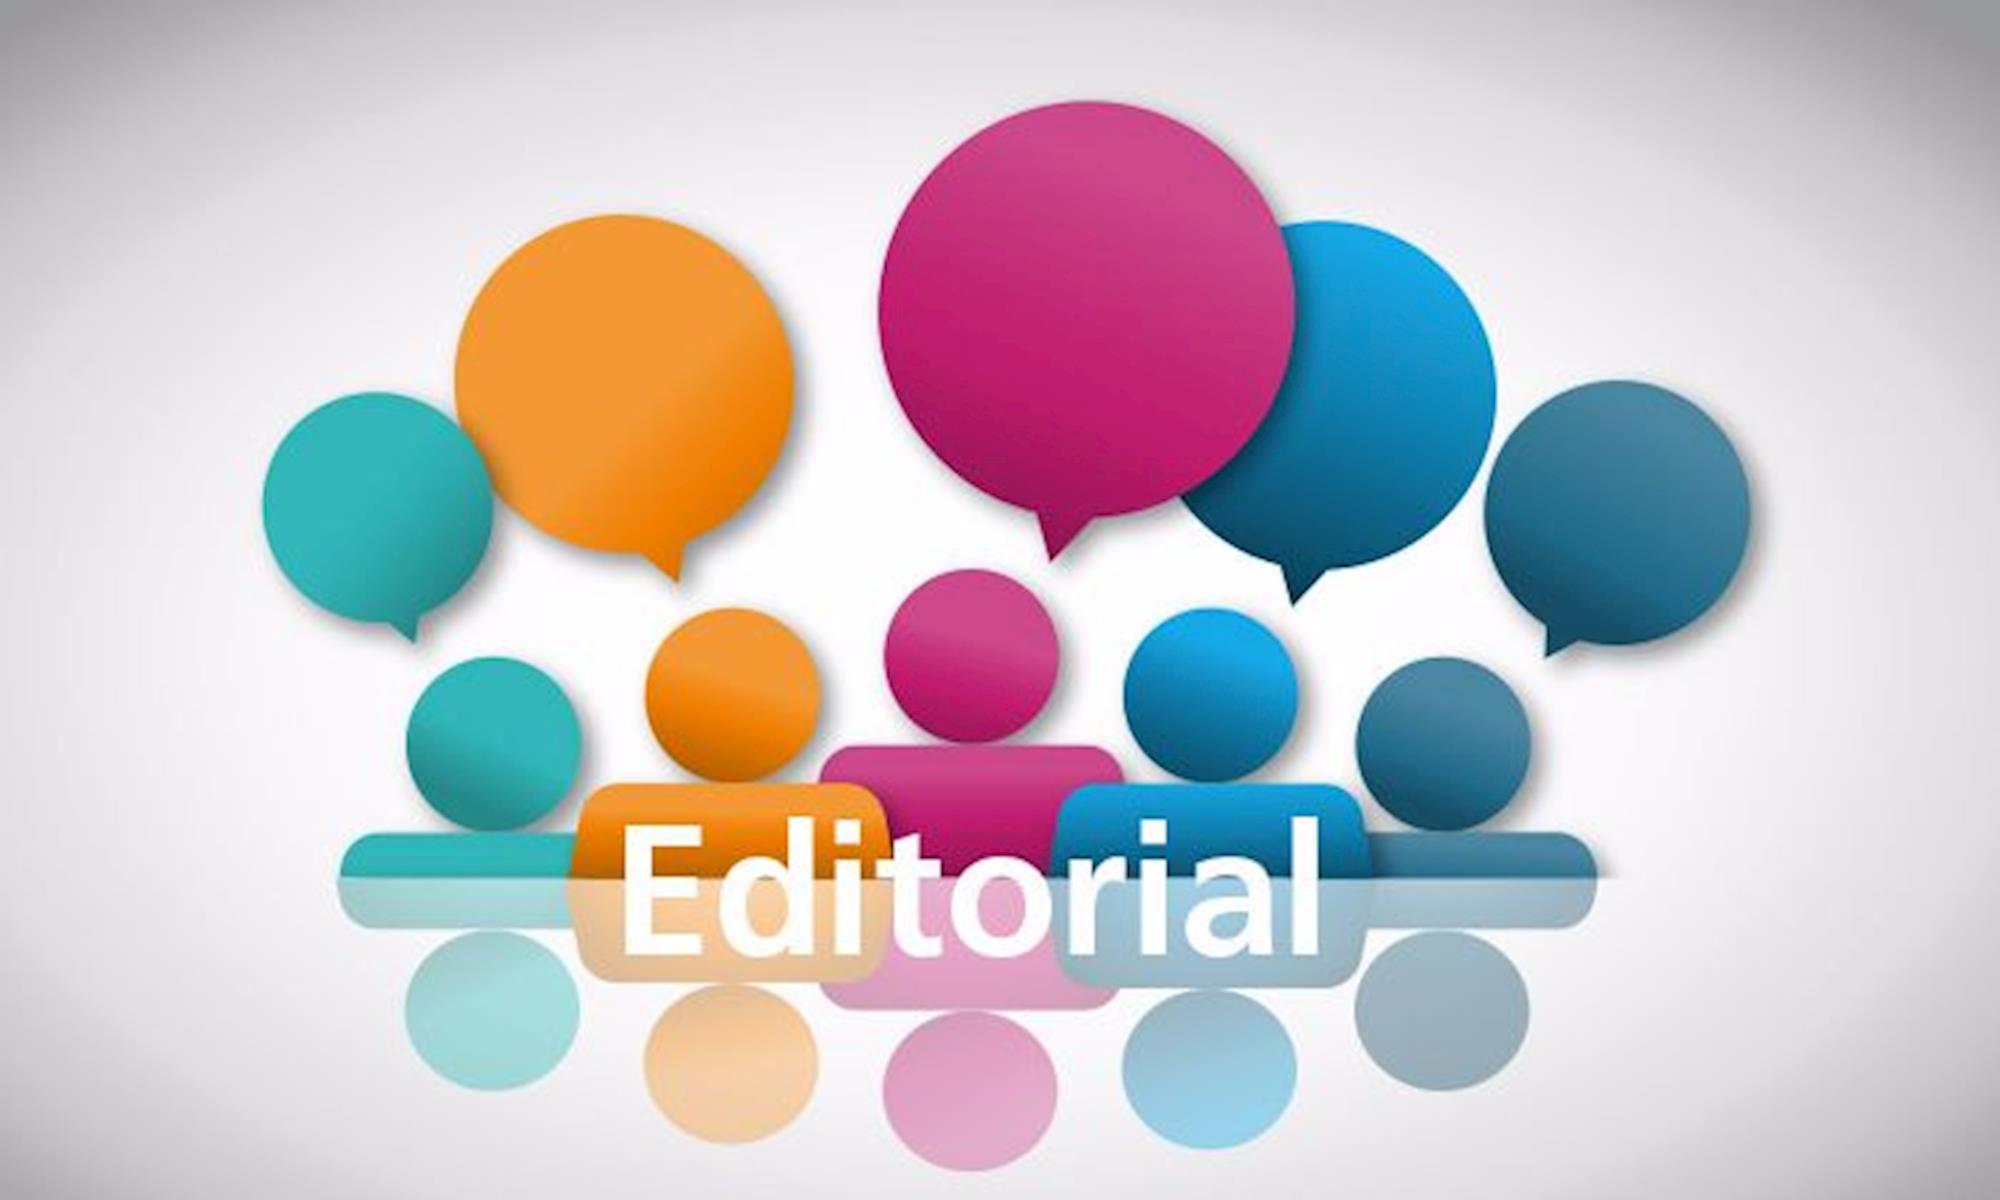 Editorial,